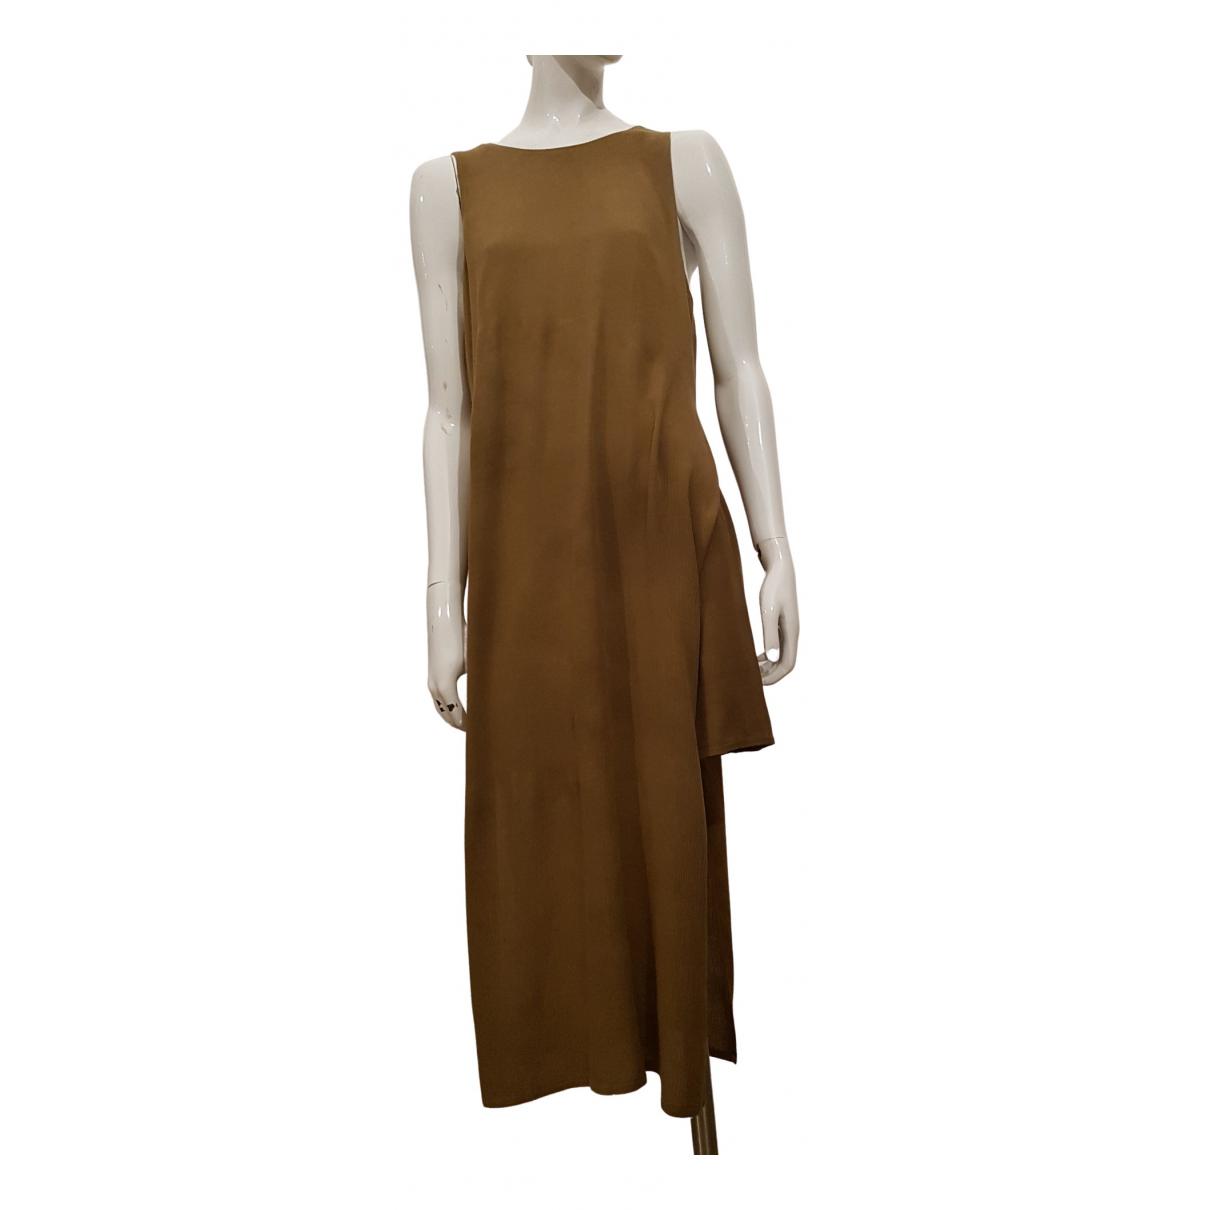 Mango \N Green dress for Women S International